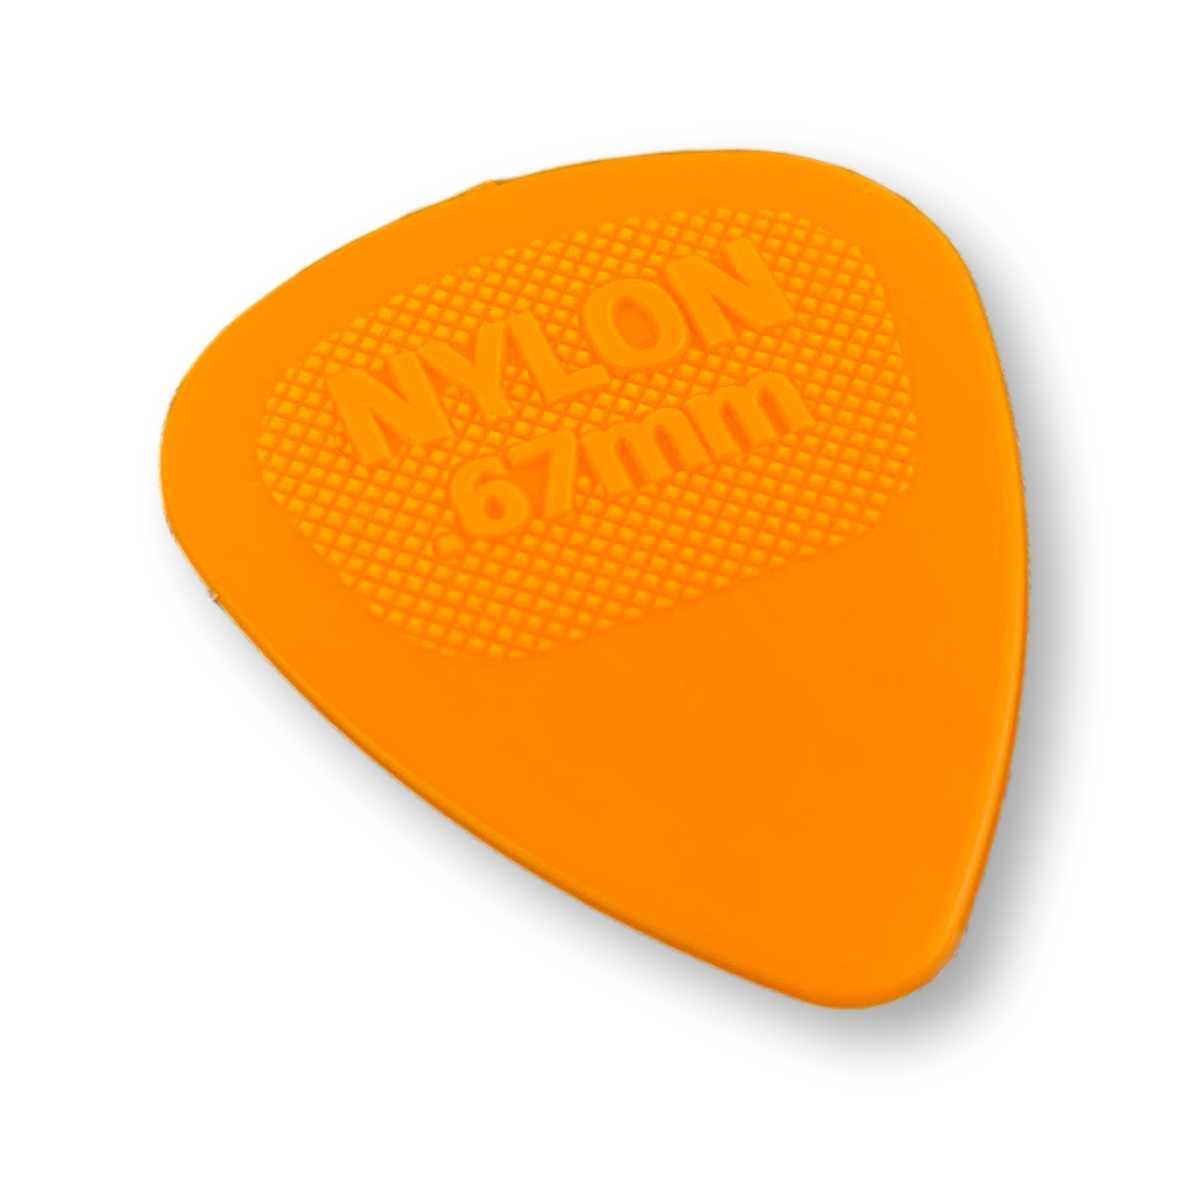 kIT 5 Palheta Dunlop 0.67 mm Nylon